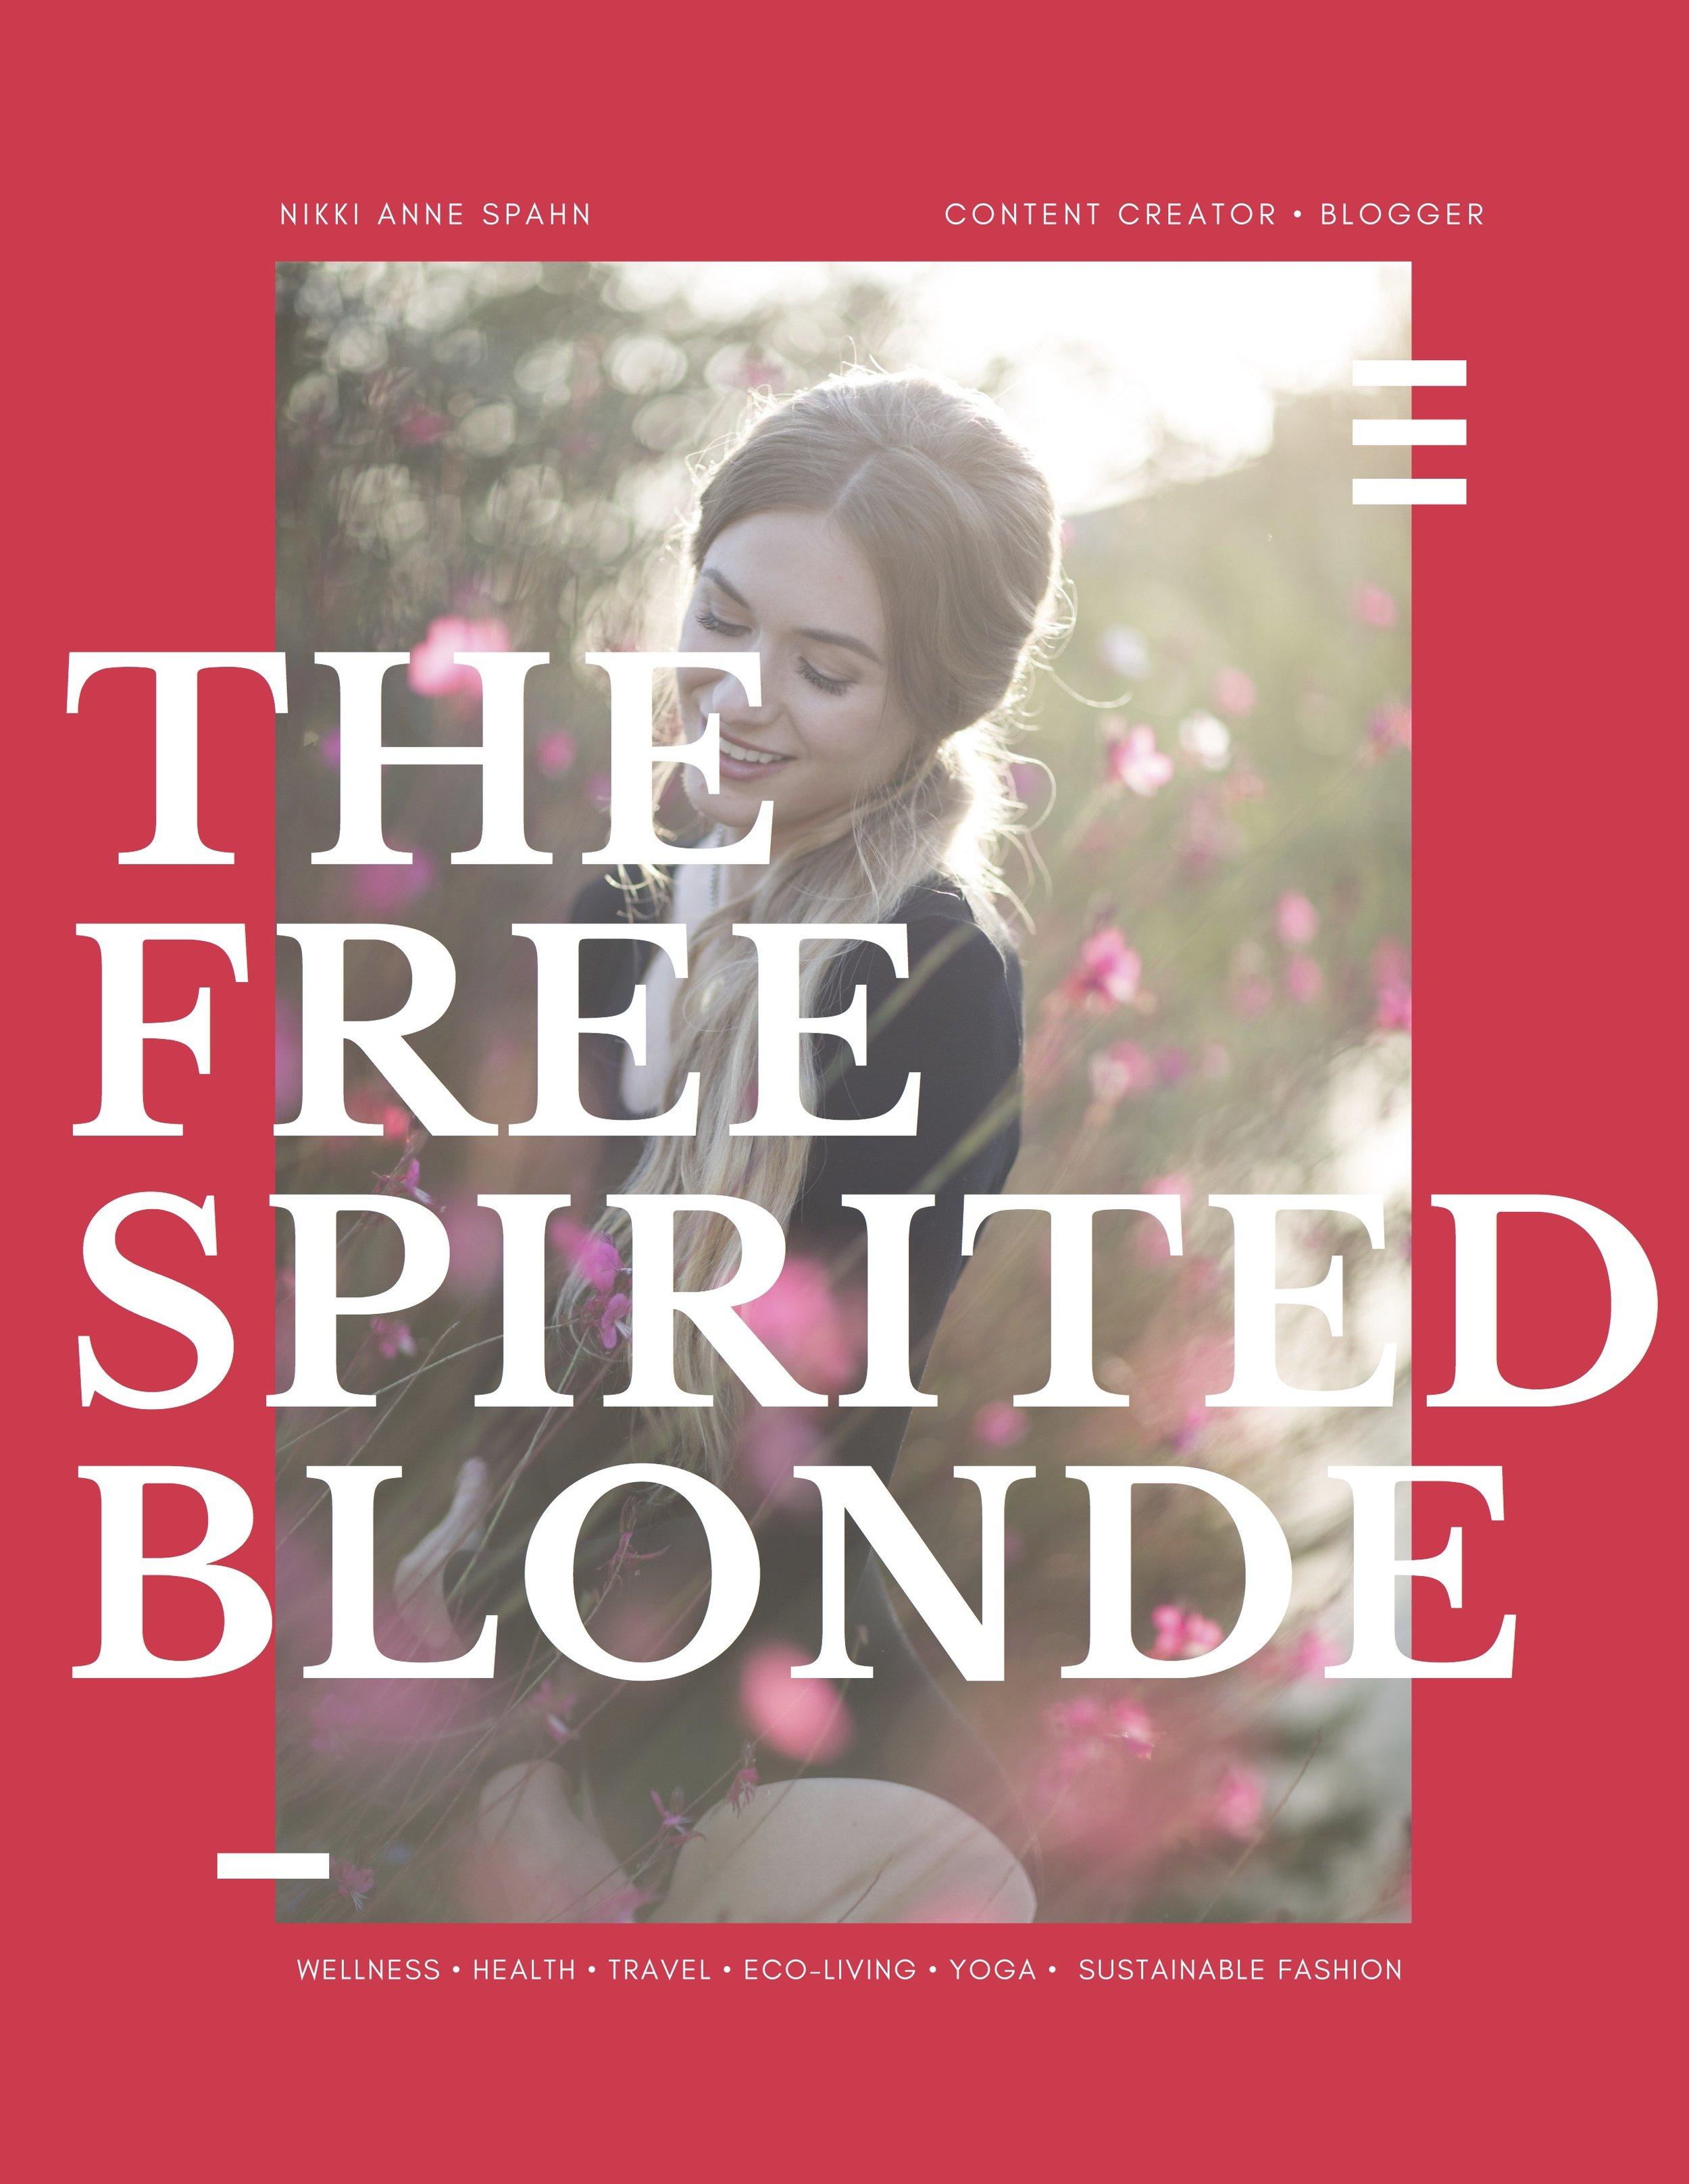 The-Free-Spirited-Blonde-2019.jpg